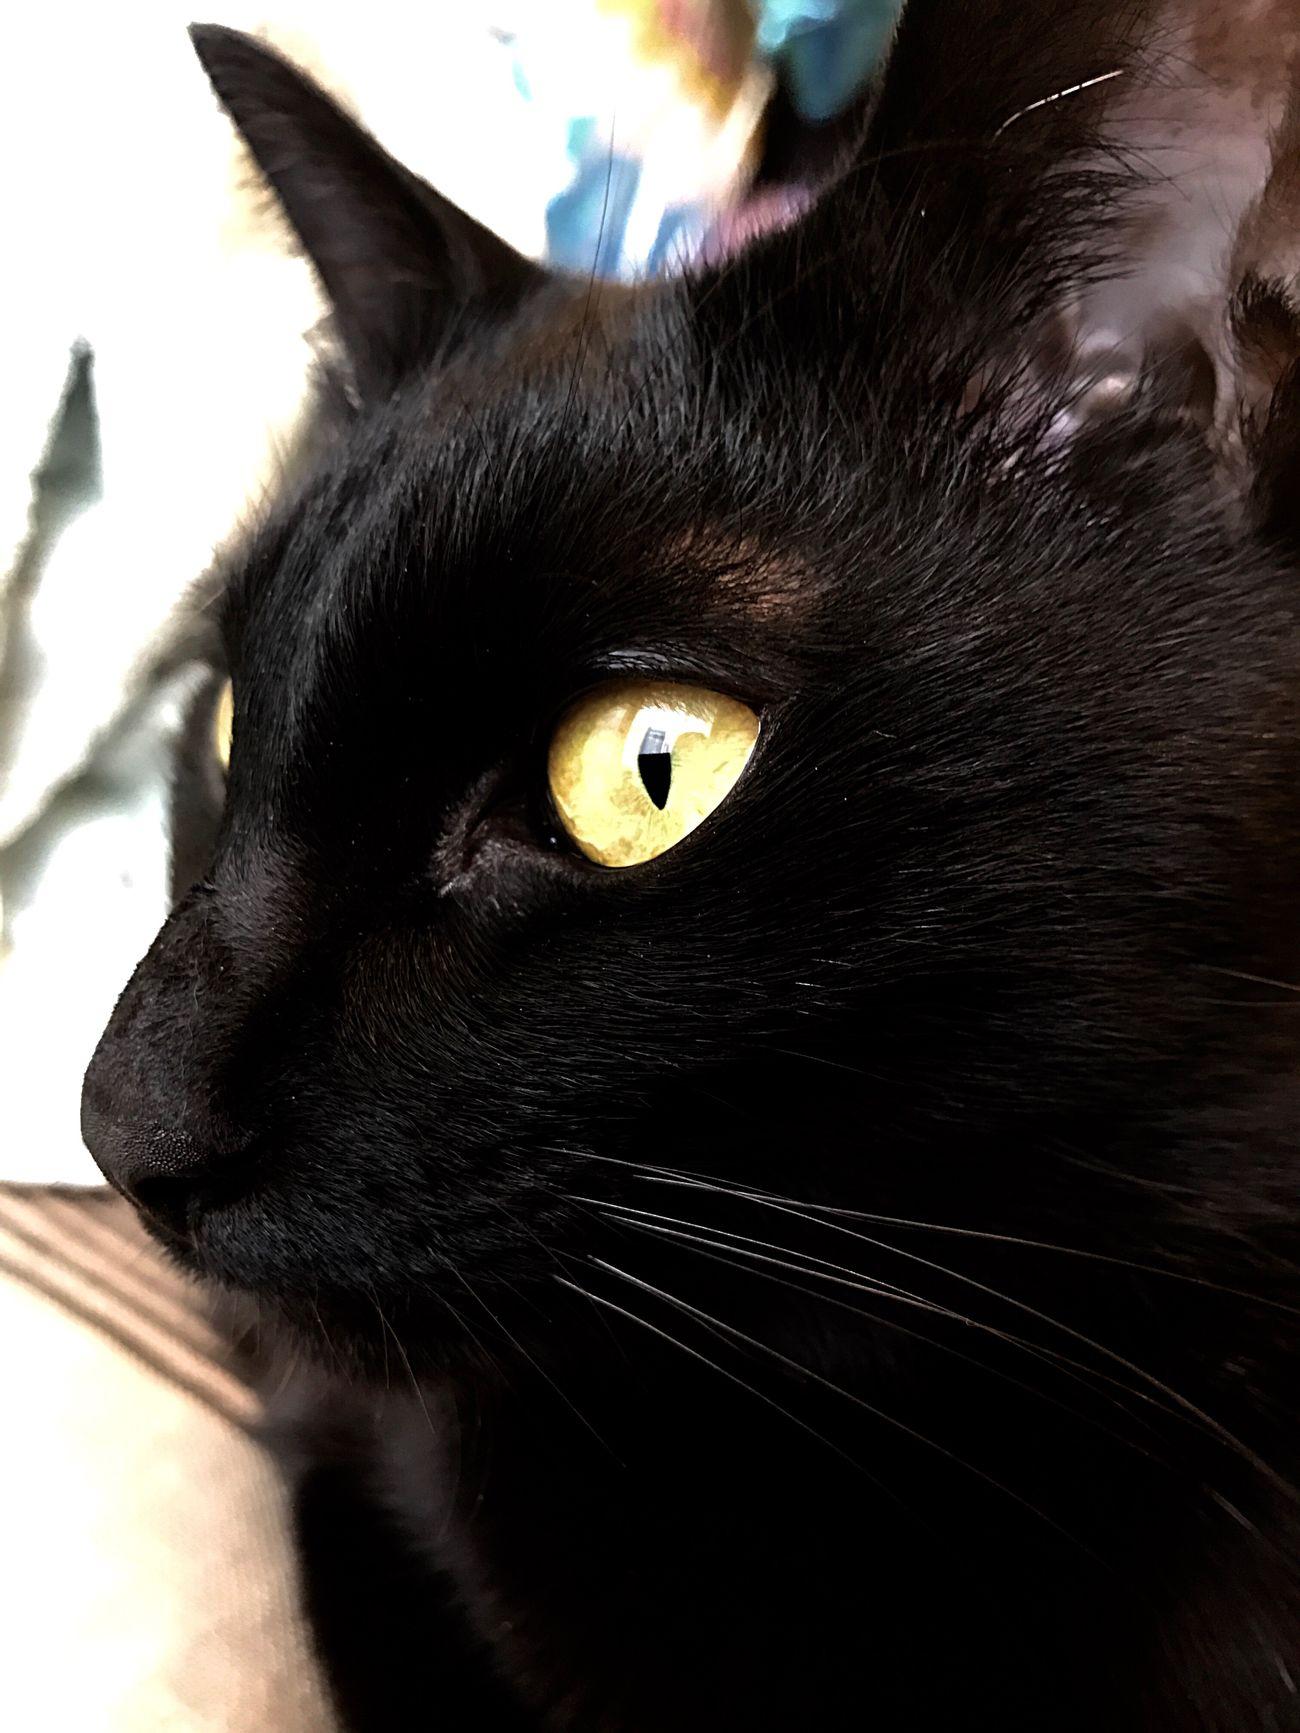 BLackCat Pets One Animal Domestic Animals Domestic Cat Animal Themes Mammal Yellow Eyes Close-up Black Color Portrait Feline Animal Head  Whisker Animal Eye No People Indoors  Day